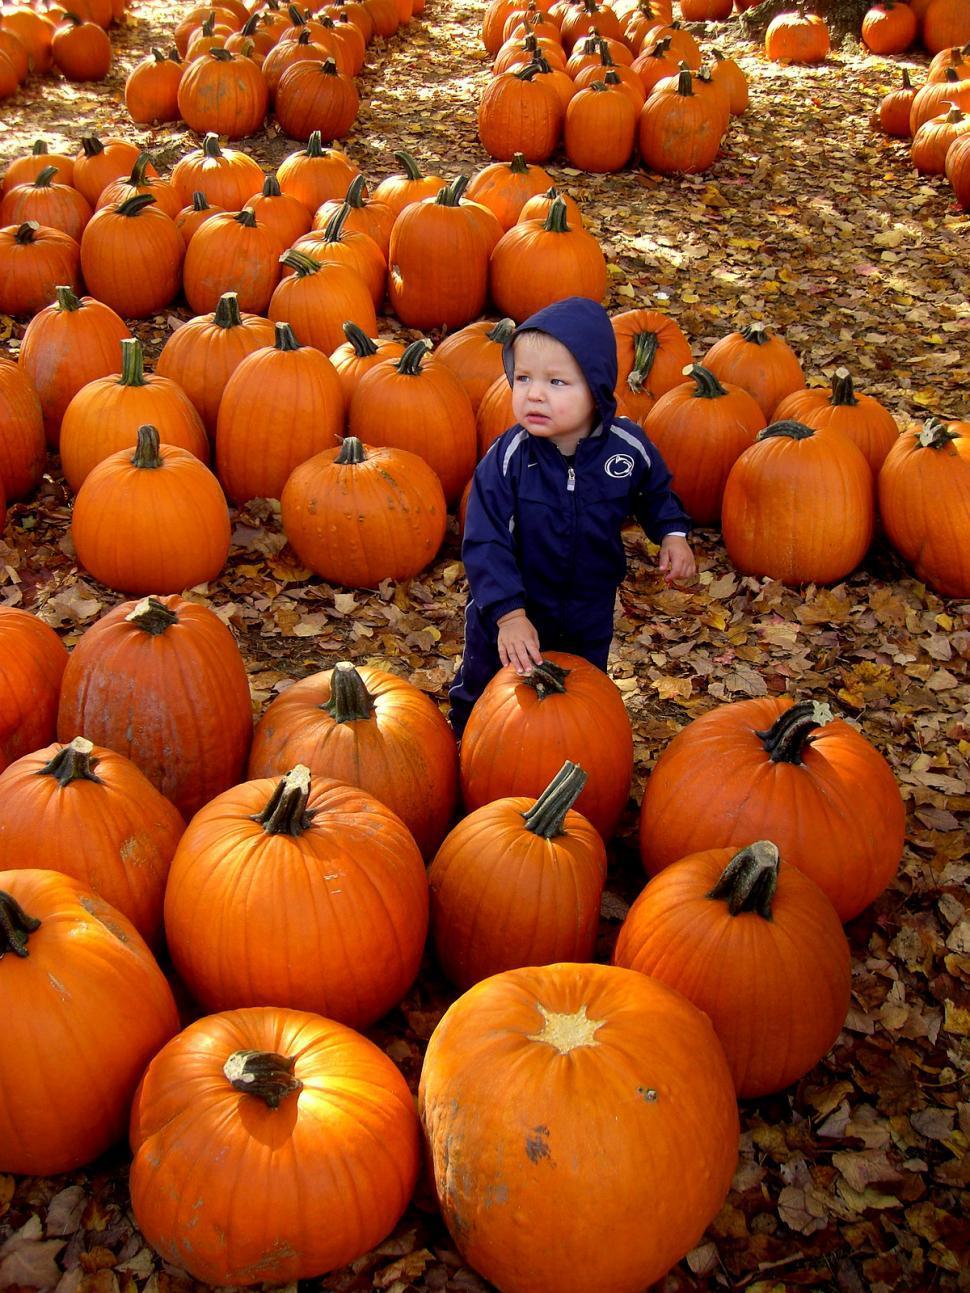 Download Free Stock HD Photo of Fall - Little boy in pumpkin patch Online